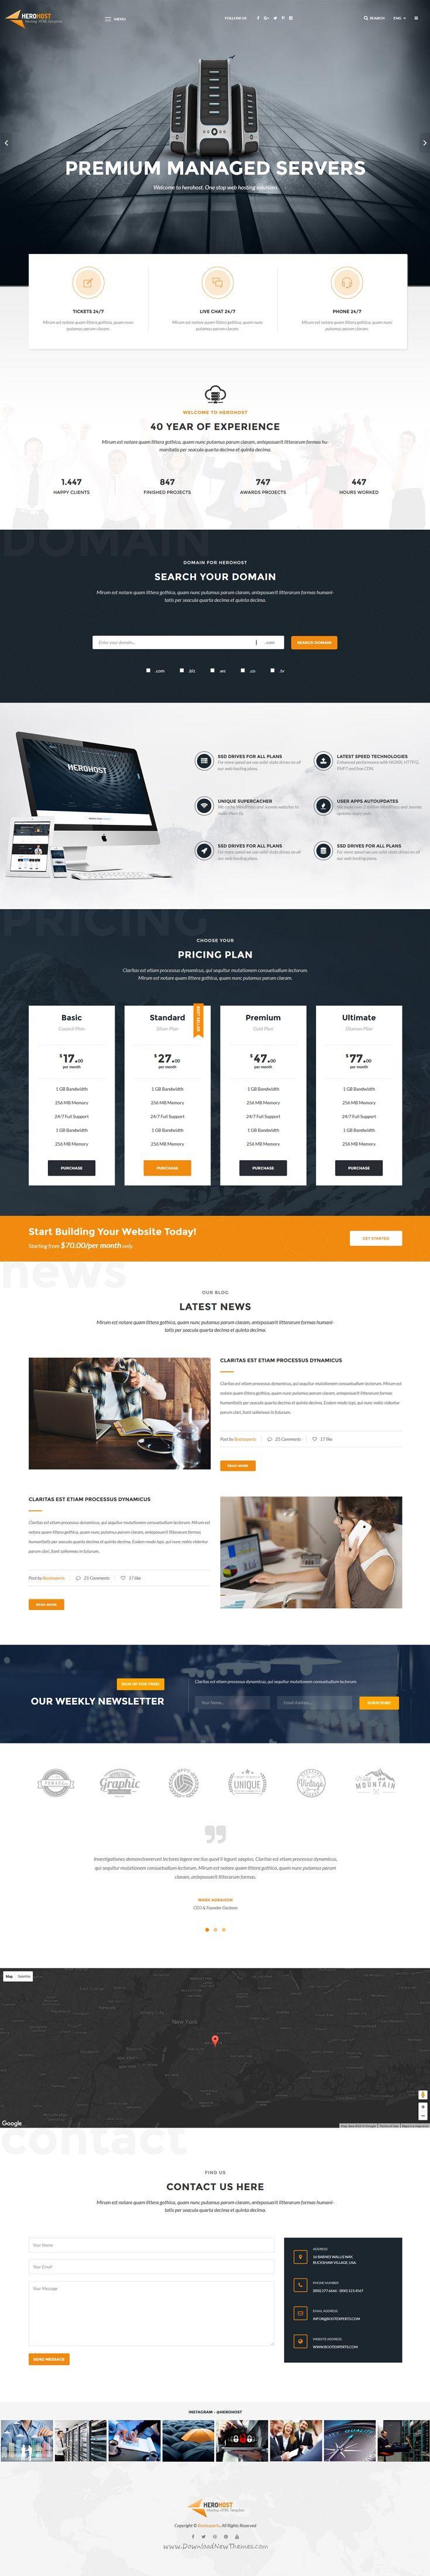 HeroHost - Web Hosting HTML5 Template | Webseite